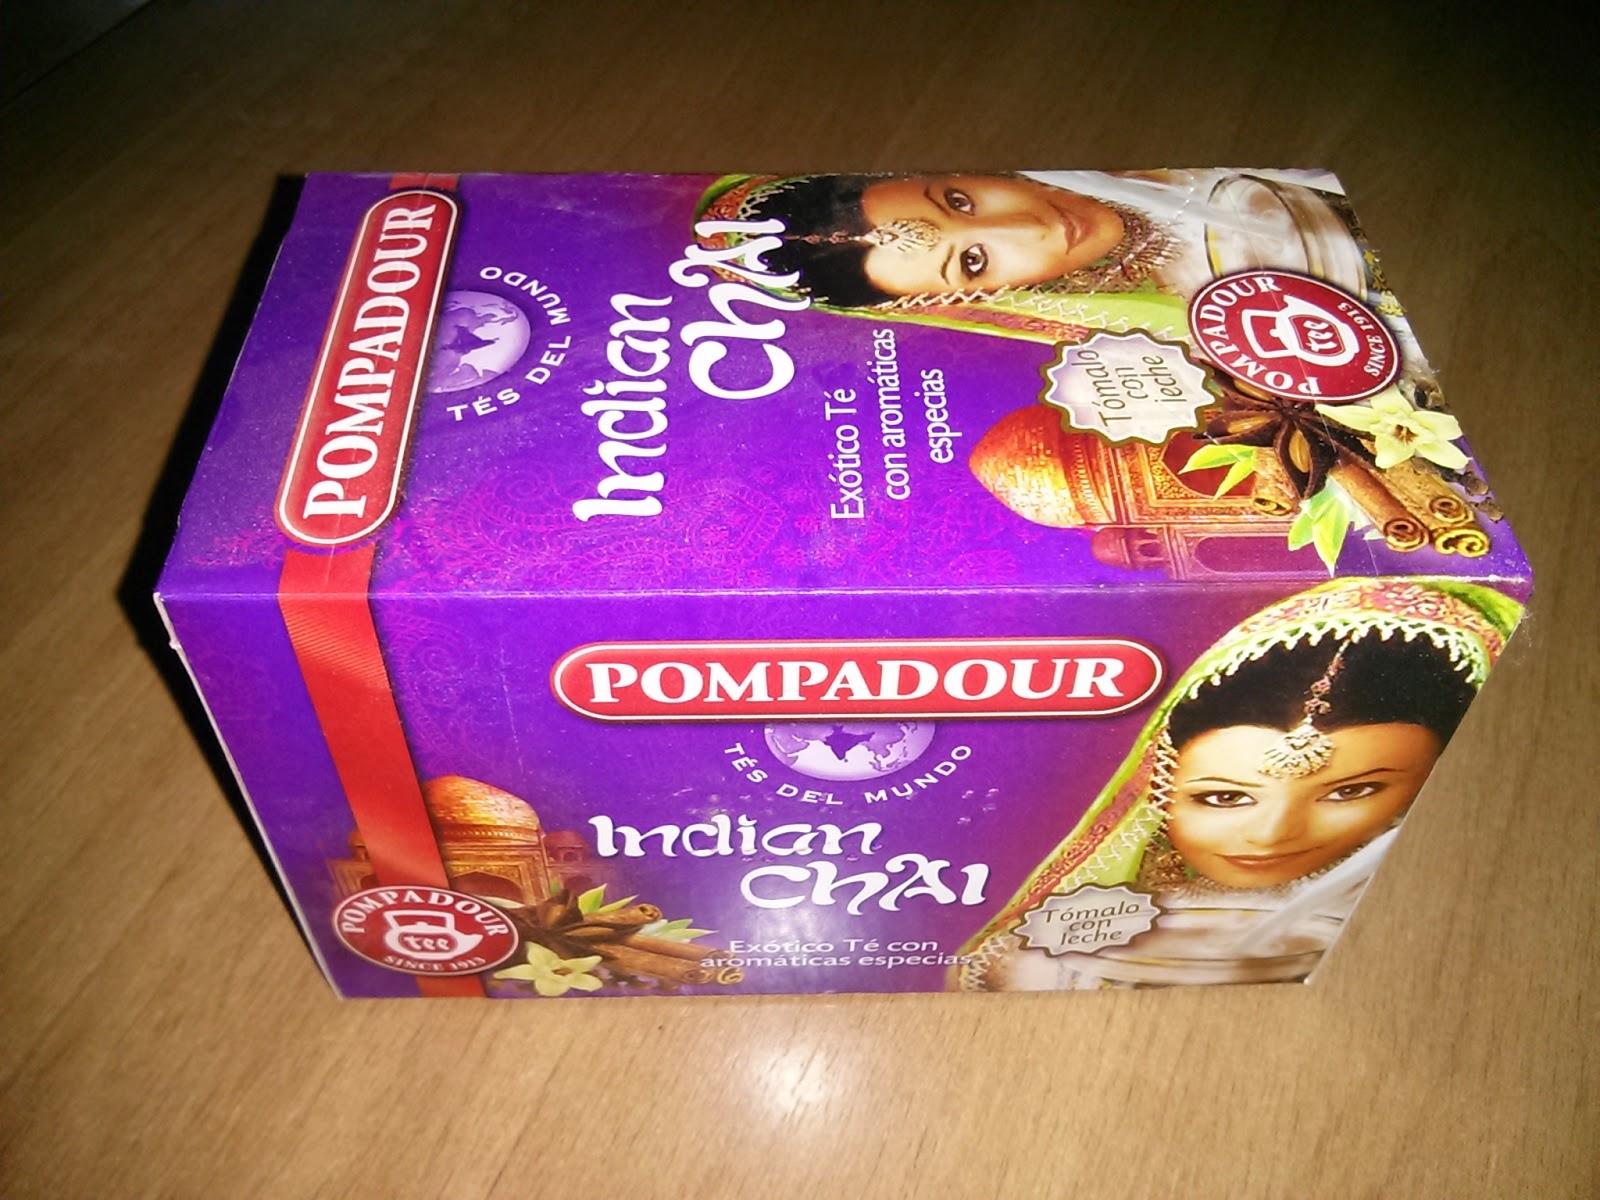 Indian Chai,